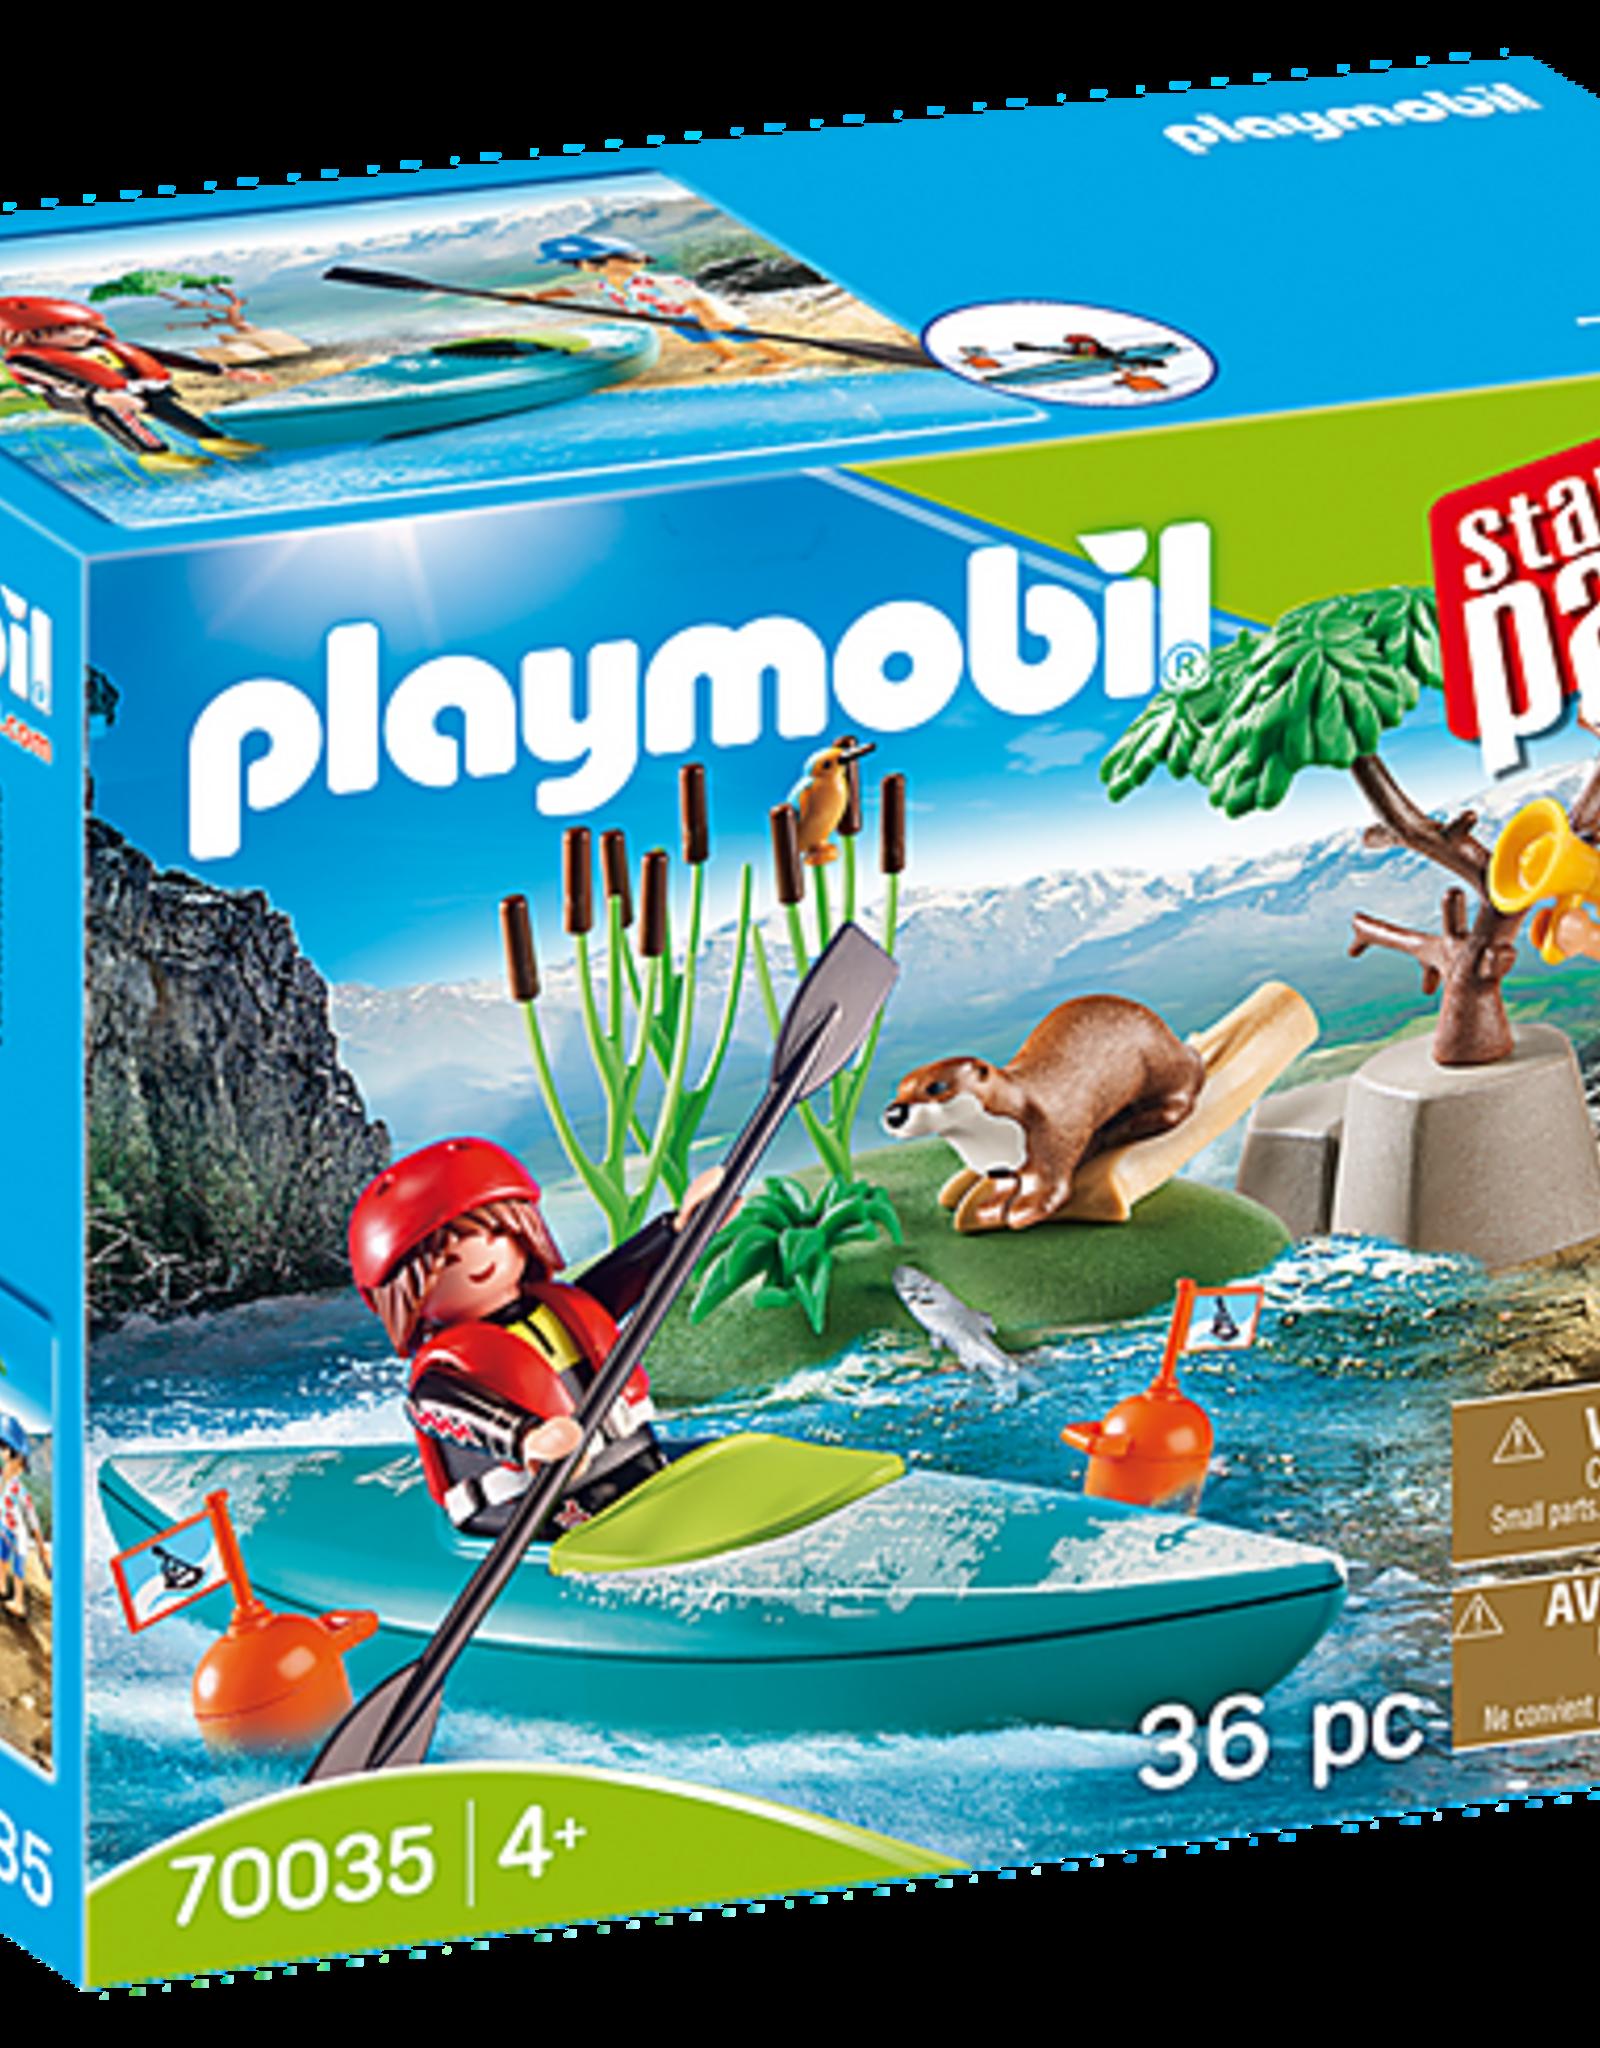 Playmobil StarterPack Kayak Adventure